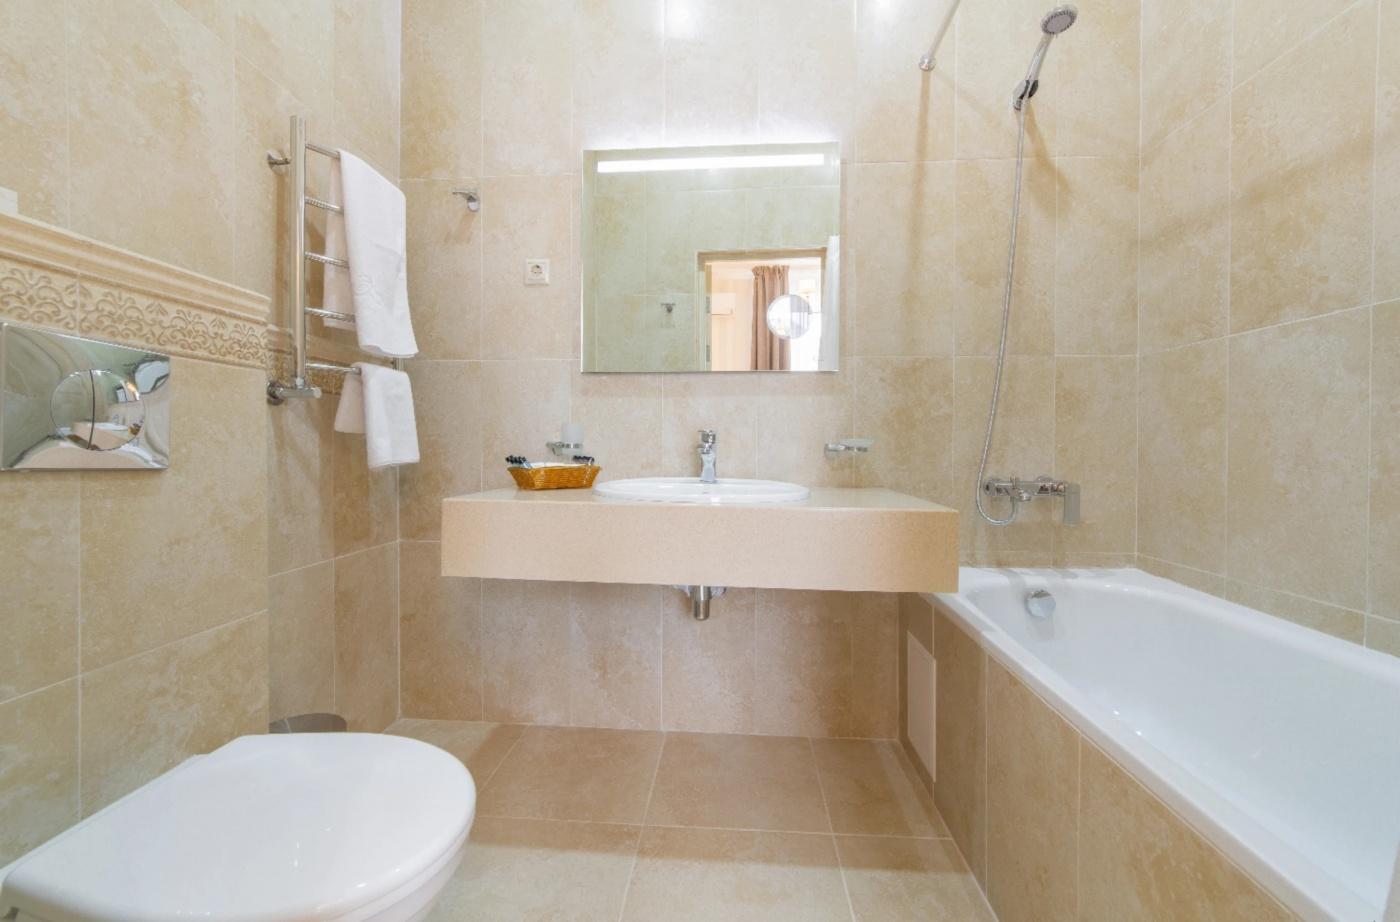 Отель «Alean Family Hotel Usadba 4*» Краснодарский край Стандарт 2-местный, фото 3